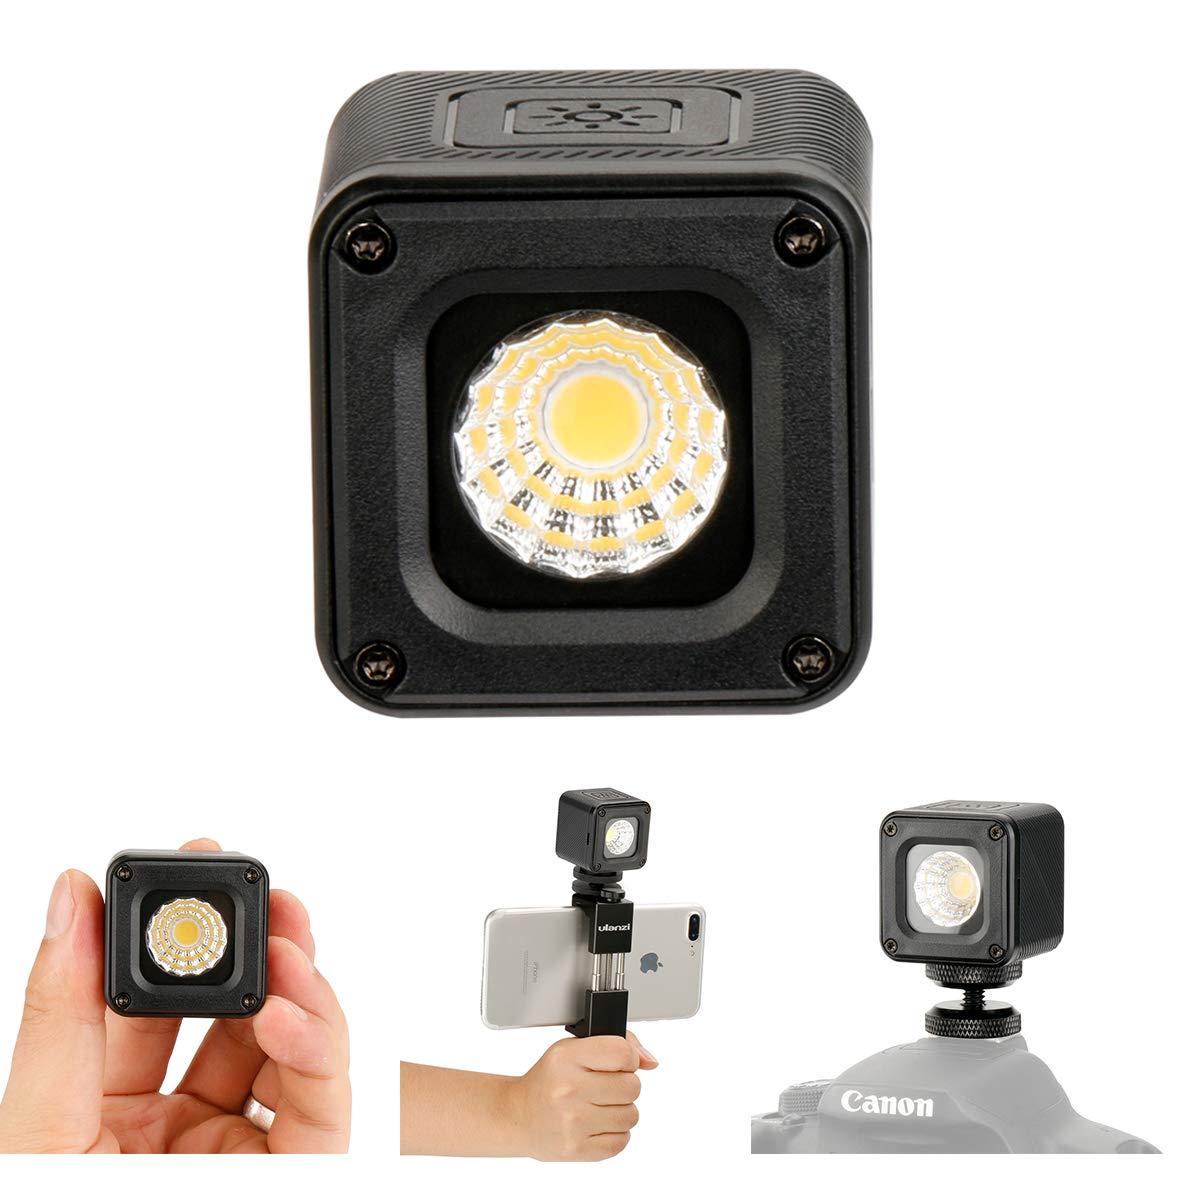 Ulanzi L1 Versatile Mini LED Light Professional Waterproof Adventure LED Lighting for Smartphone Camera Drone Photography, Video, Underwater, Bike, Camping, Compatible for DJI Gopro Canon Nikon DSLR by ULANZI